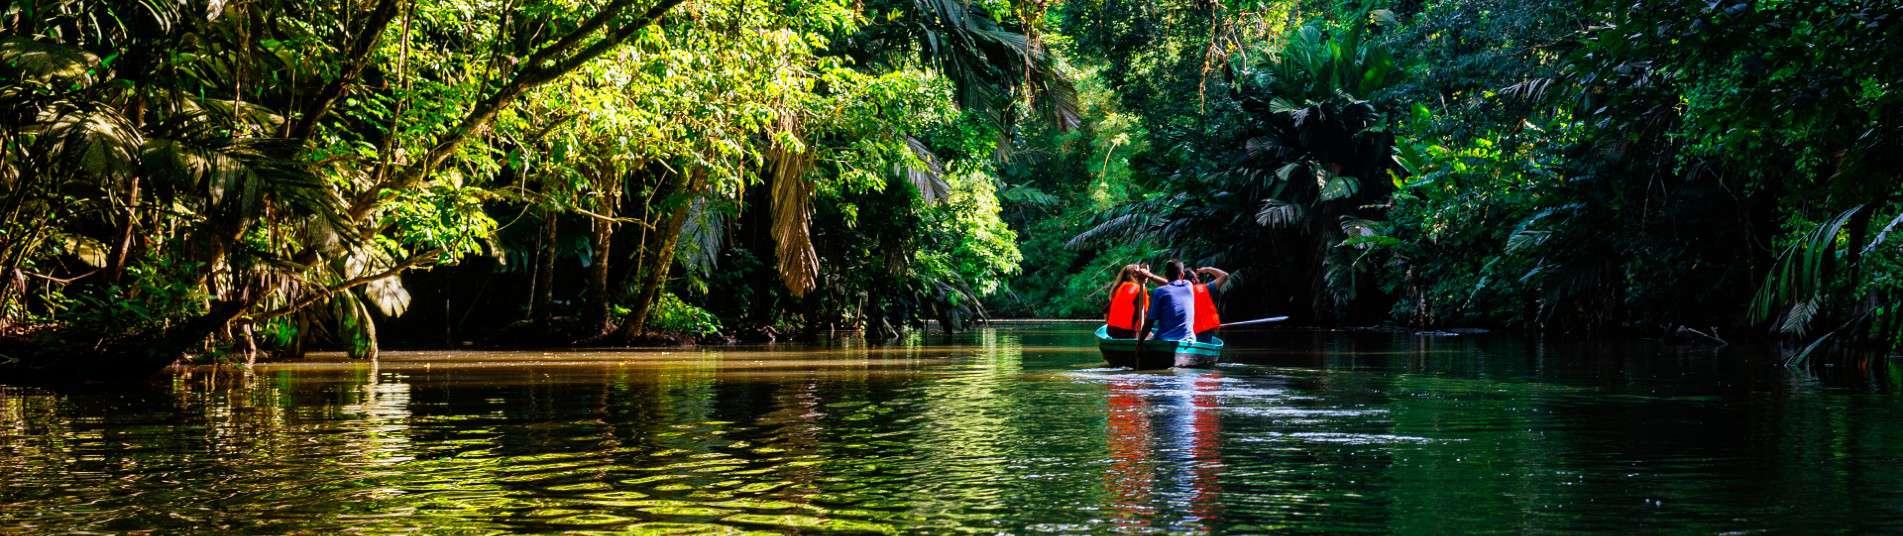 Pirogue dans la mangrove du Parc Tortuguero Costa Rica